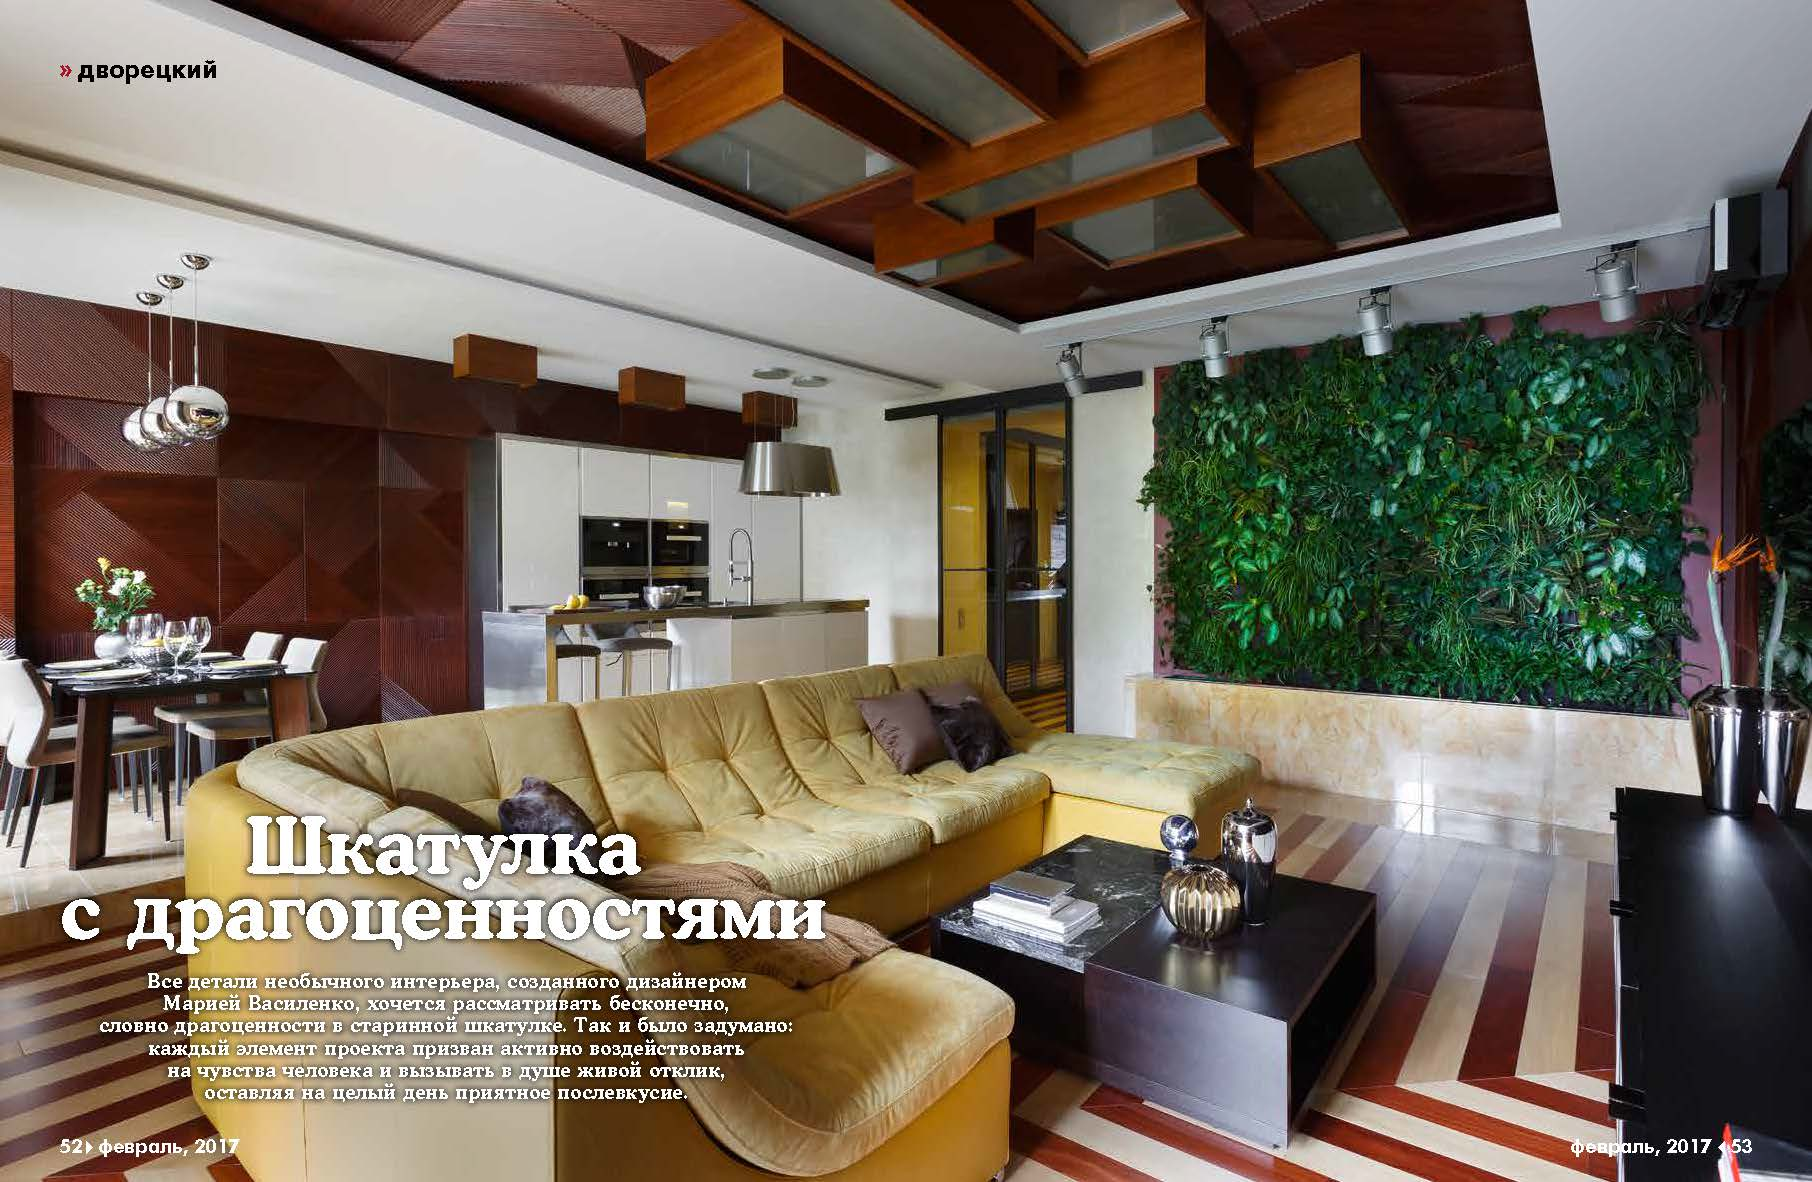 Публикация проекта Марии Василенко Шкатулка с драгоценностями